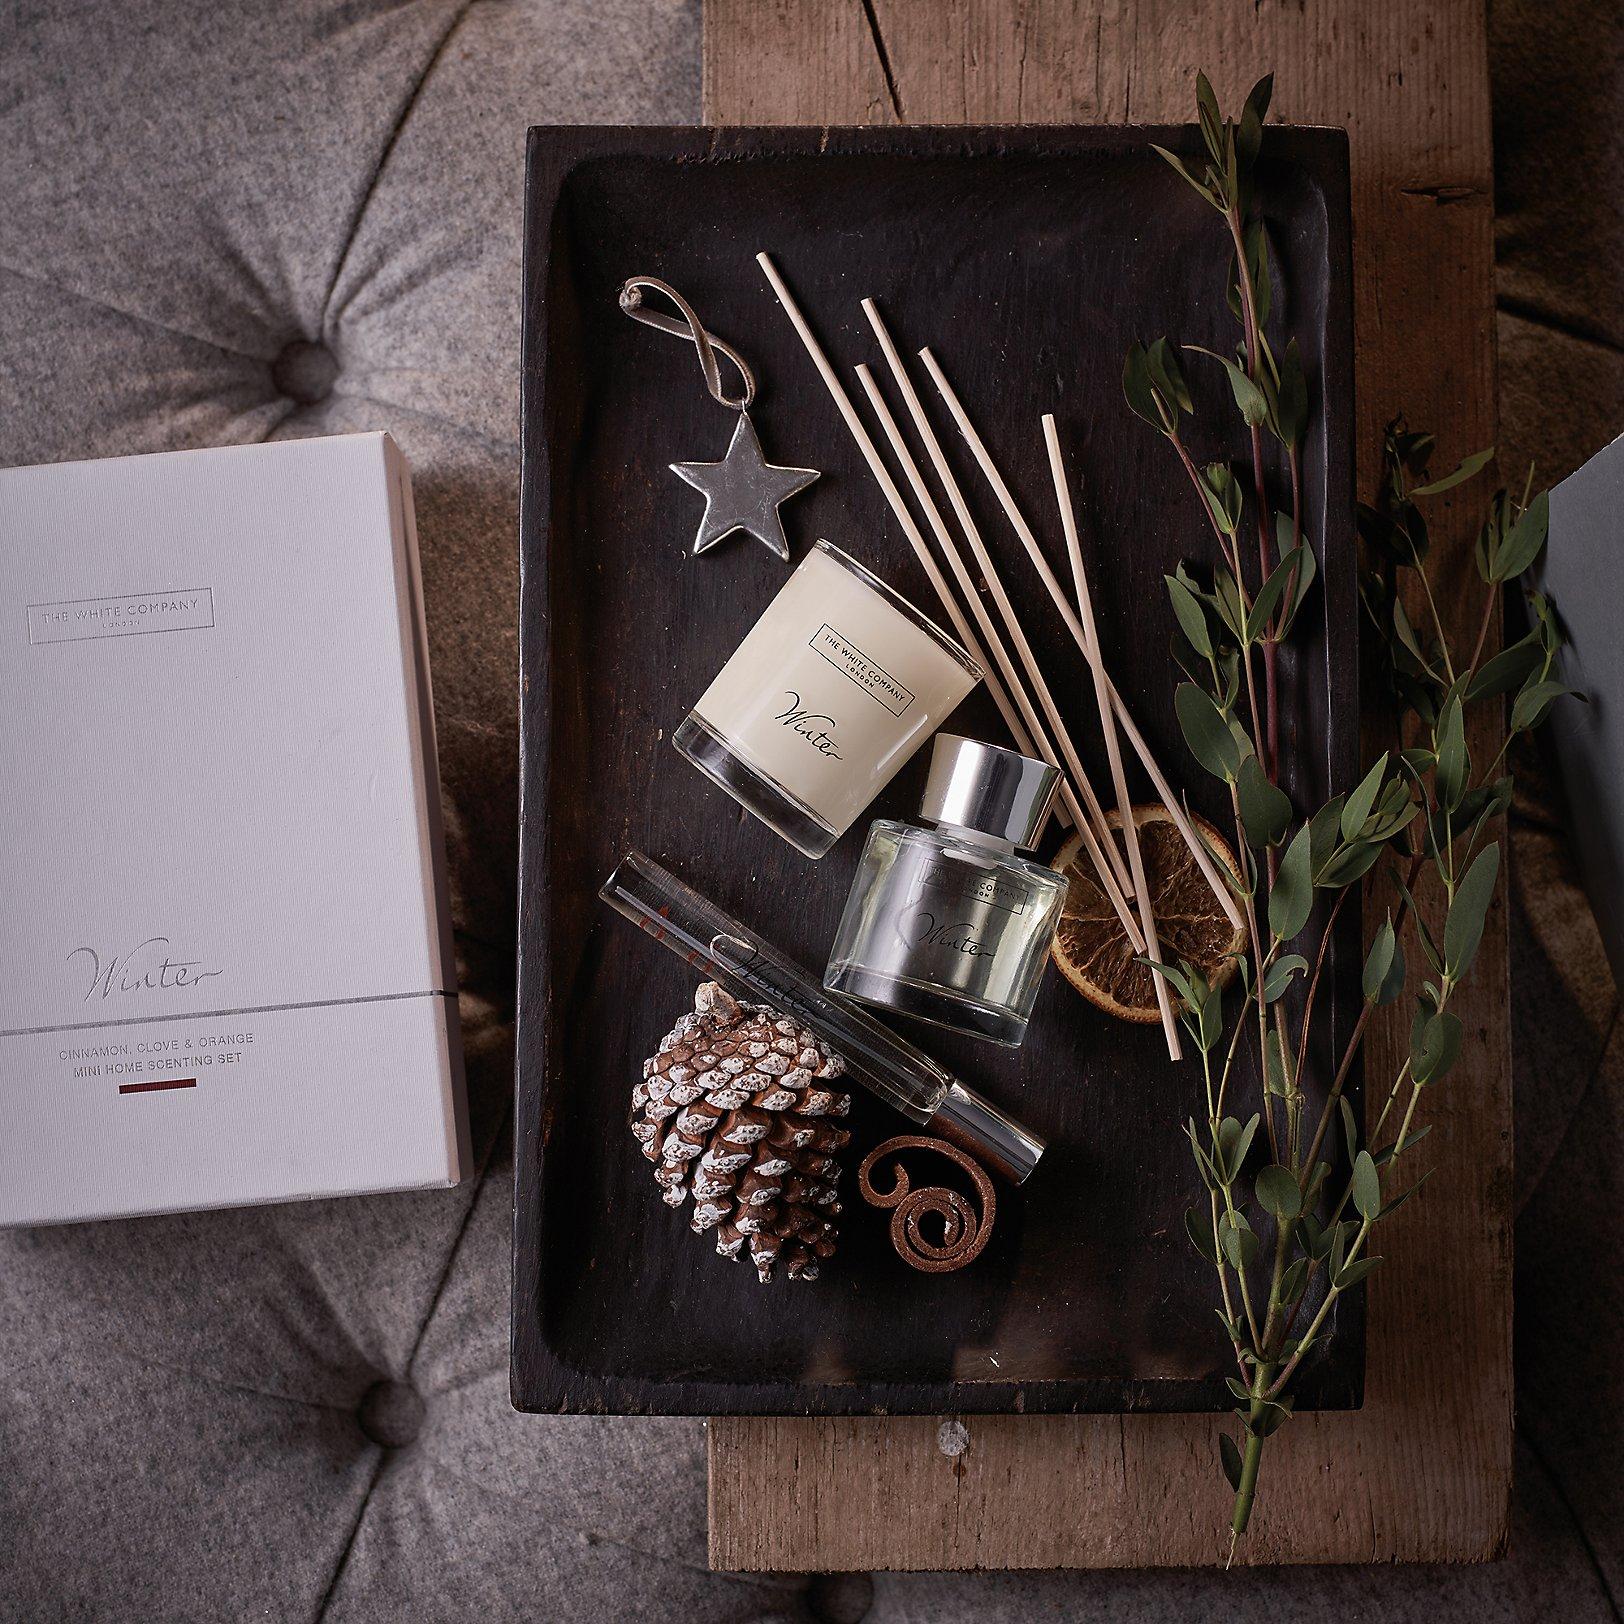 Interior design home fragrance gift set - Winter Collection Winter Mini Home Scenting Set